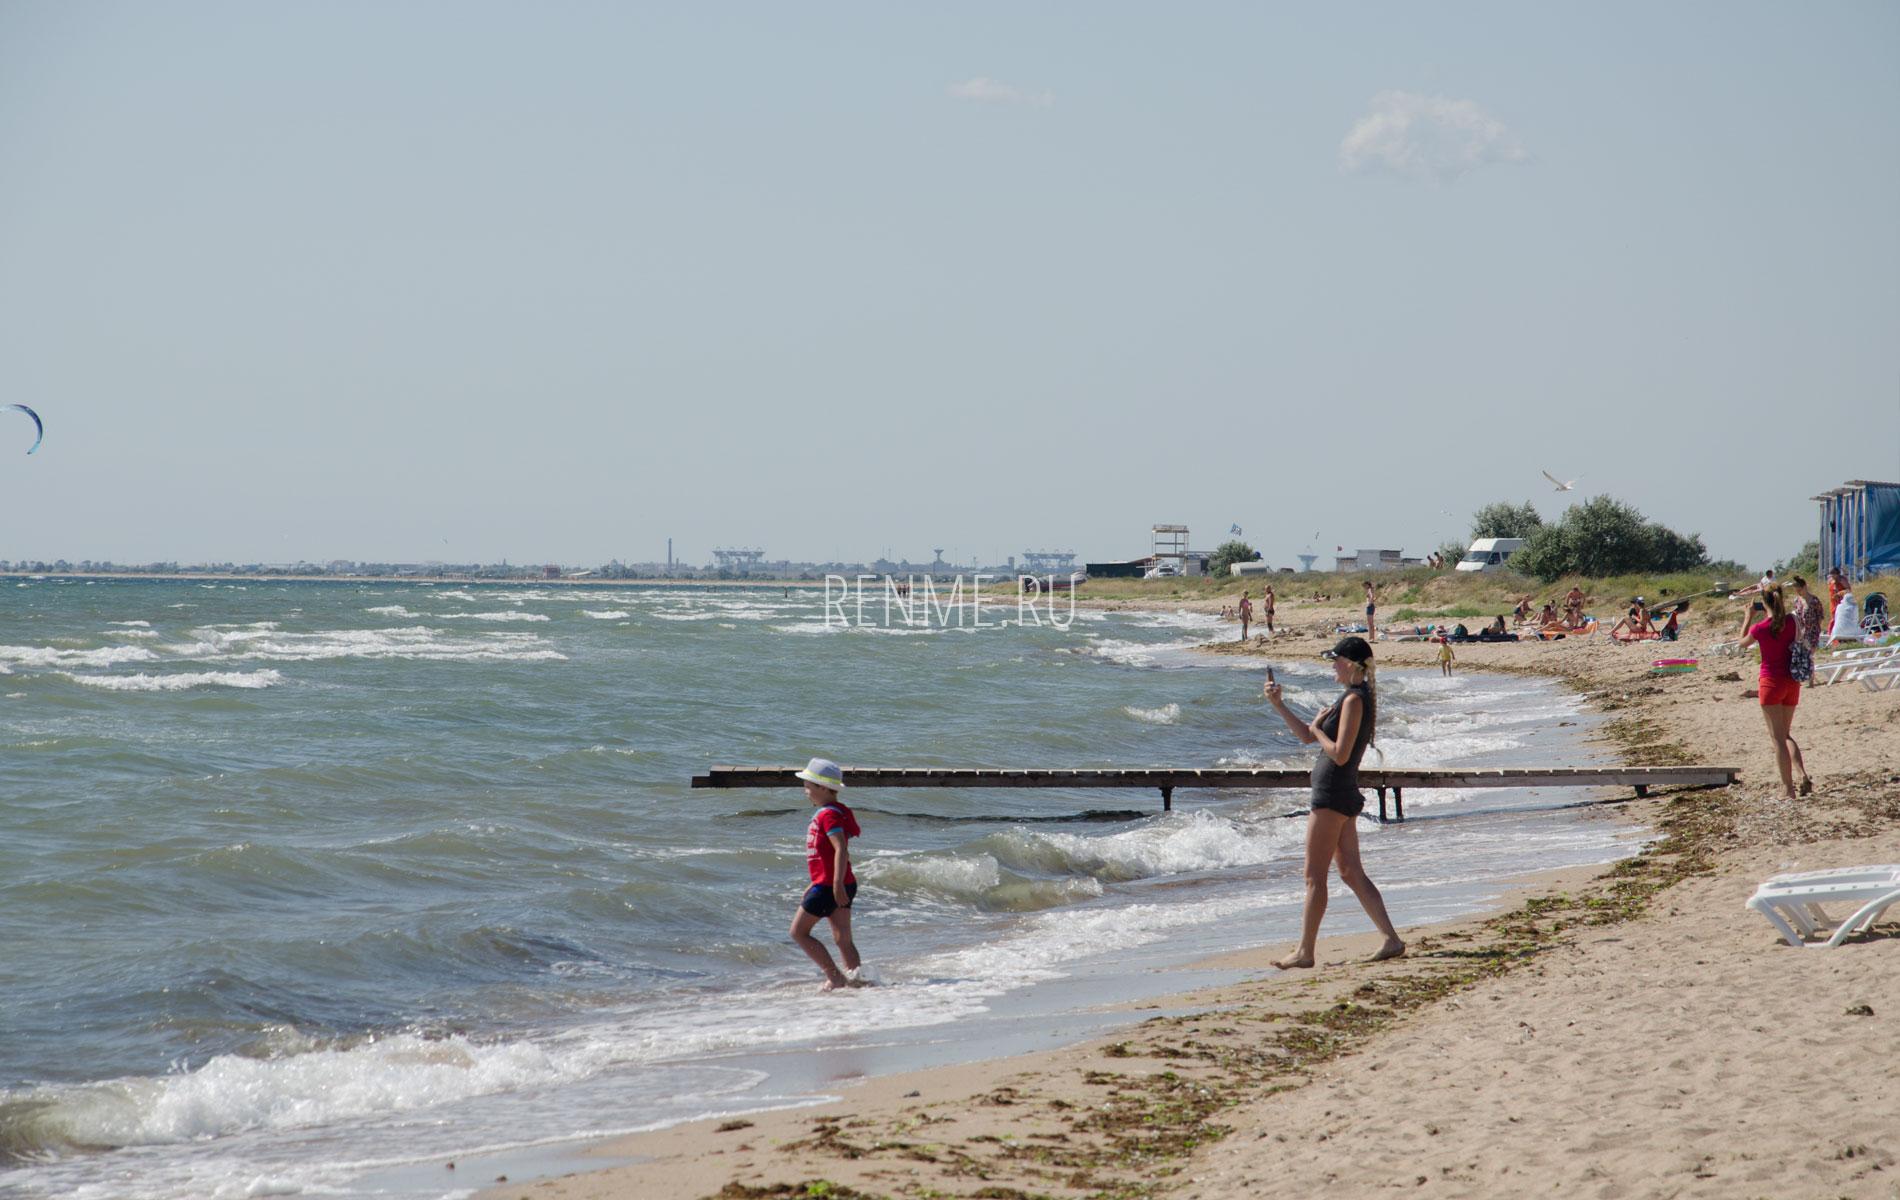 Селфи на пляже СОЮЗ-2004. Фото Заозёрного